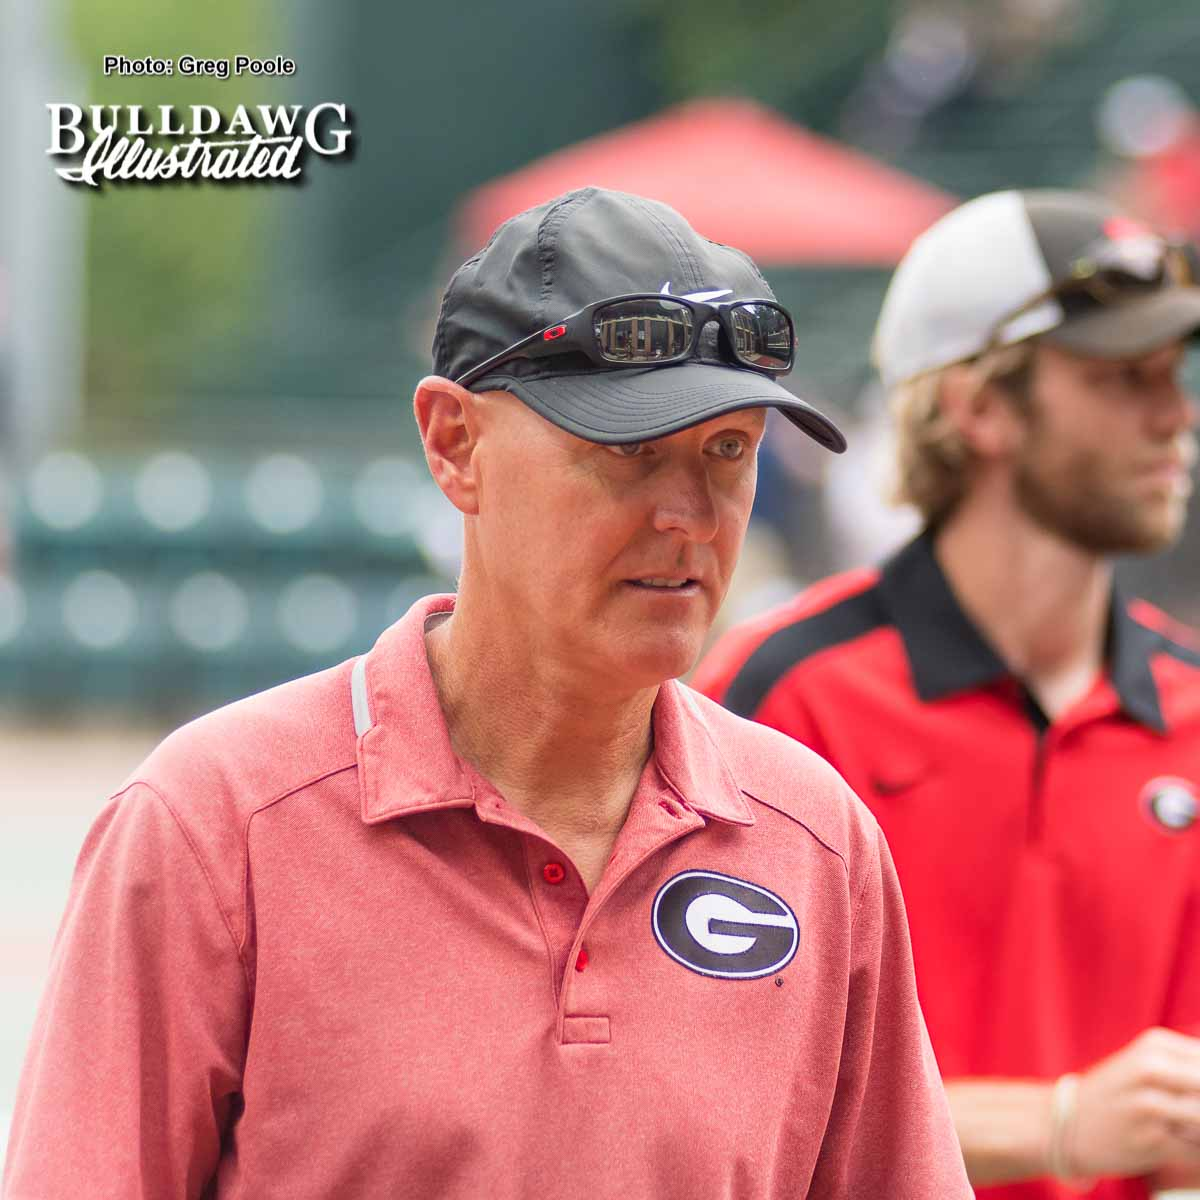 Jeff Wallace, Head coach UGA Women's Tennis - NCAA Regional - May 13, 2017